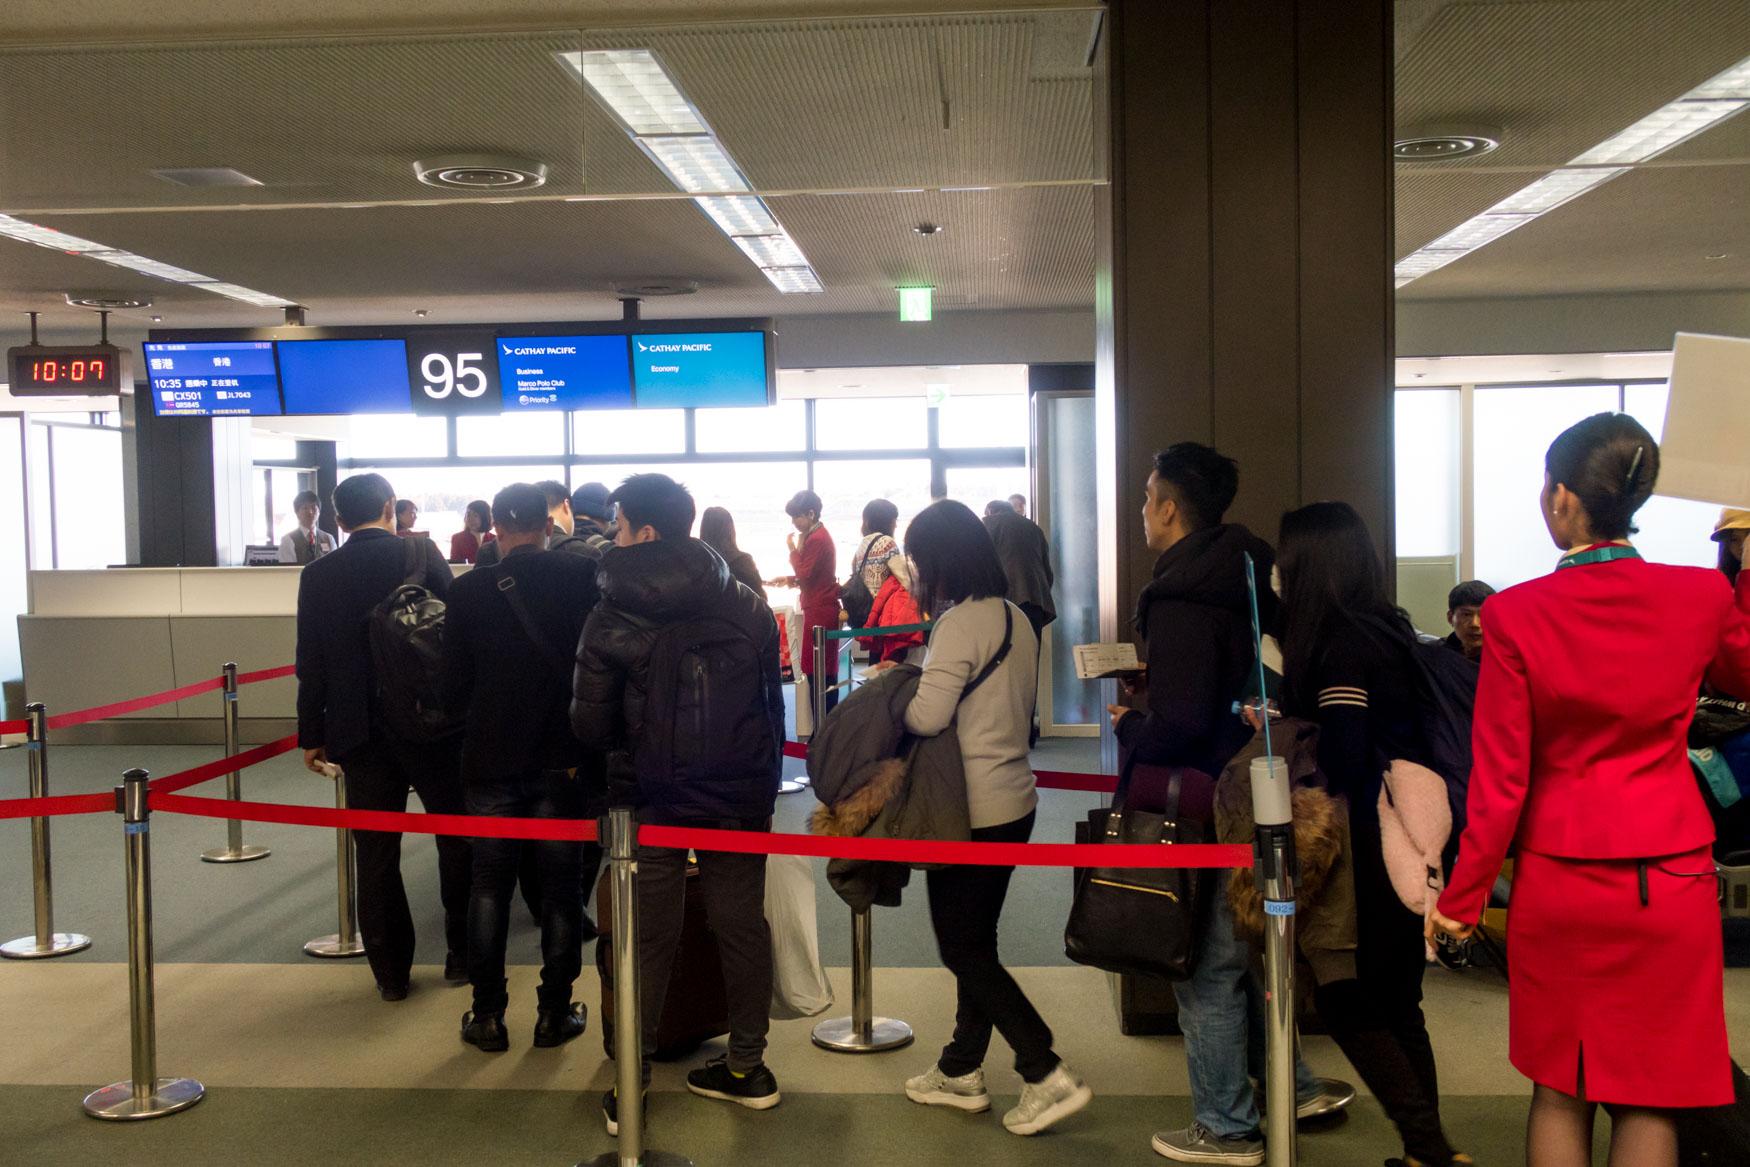 Boarding in Progress at Tokyo Narita Gate 95